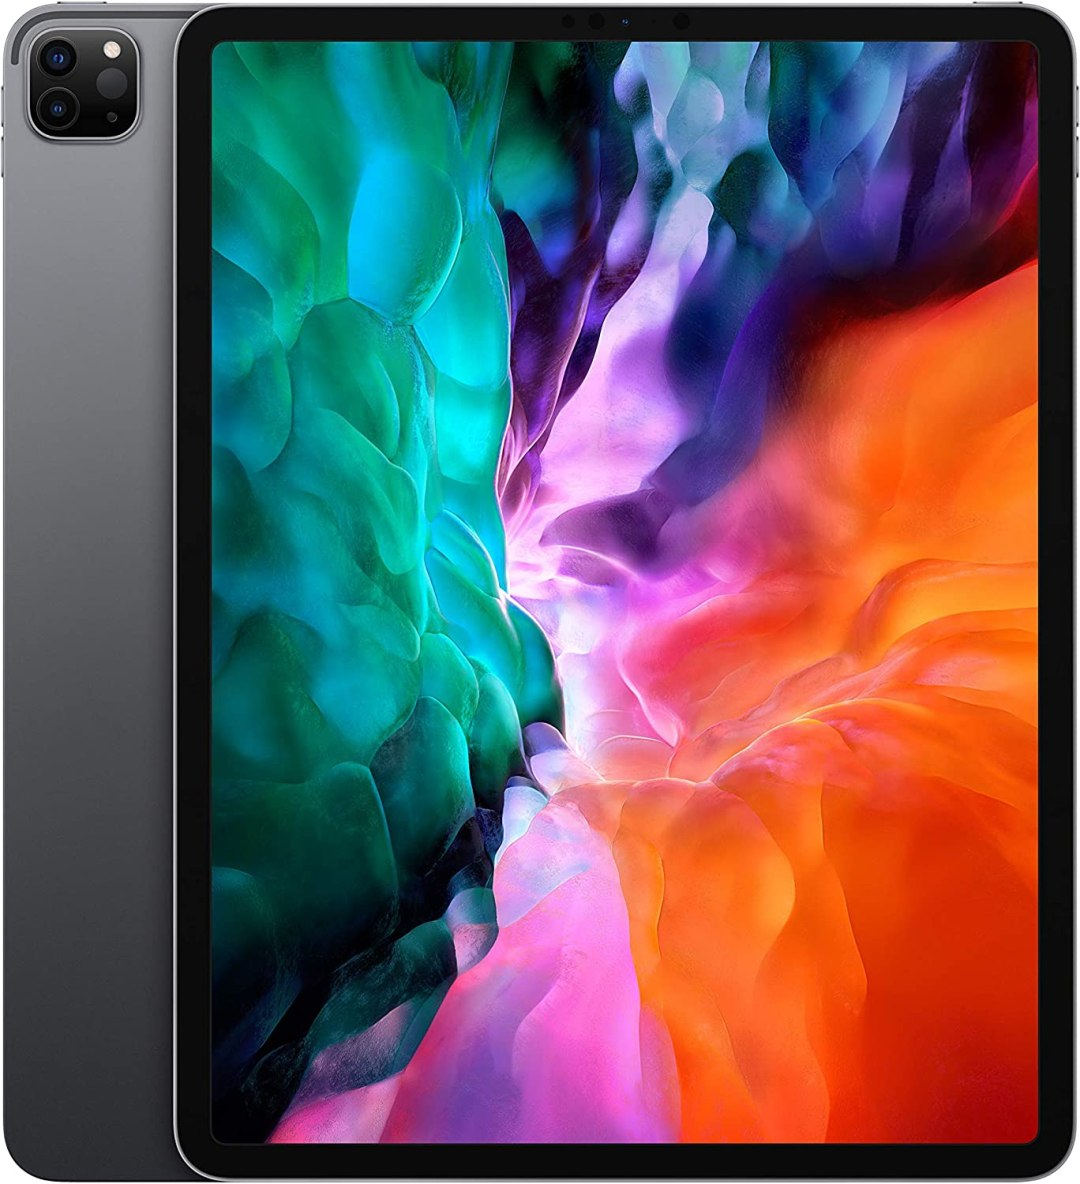 Apple iPad Pro (12,9Pouces, Wi-FI, 128Go) - Gris sidéral